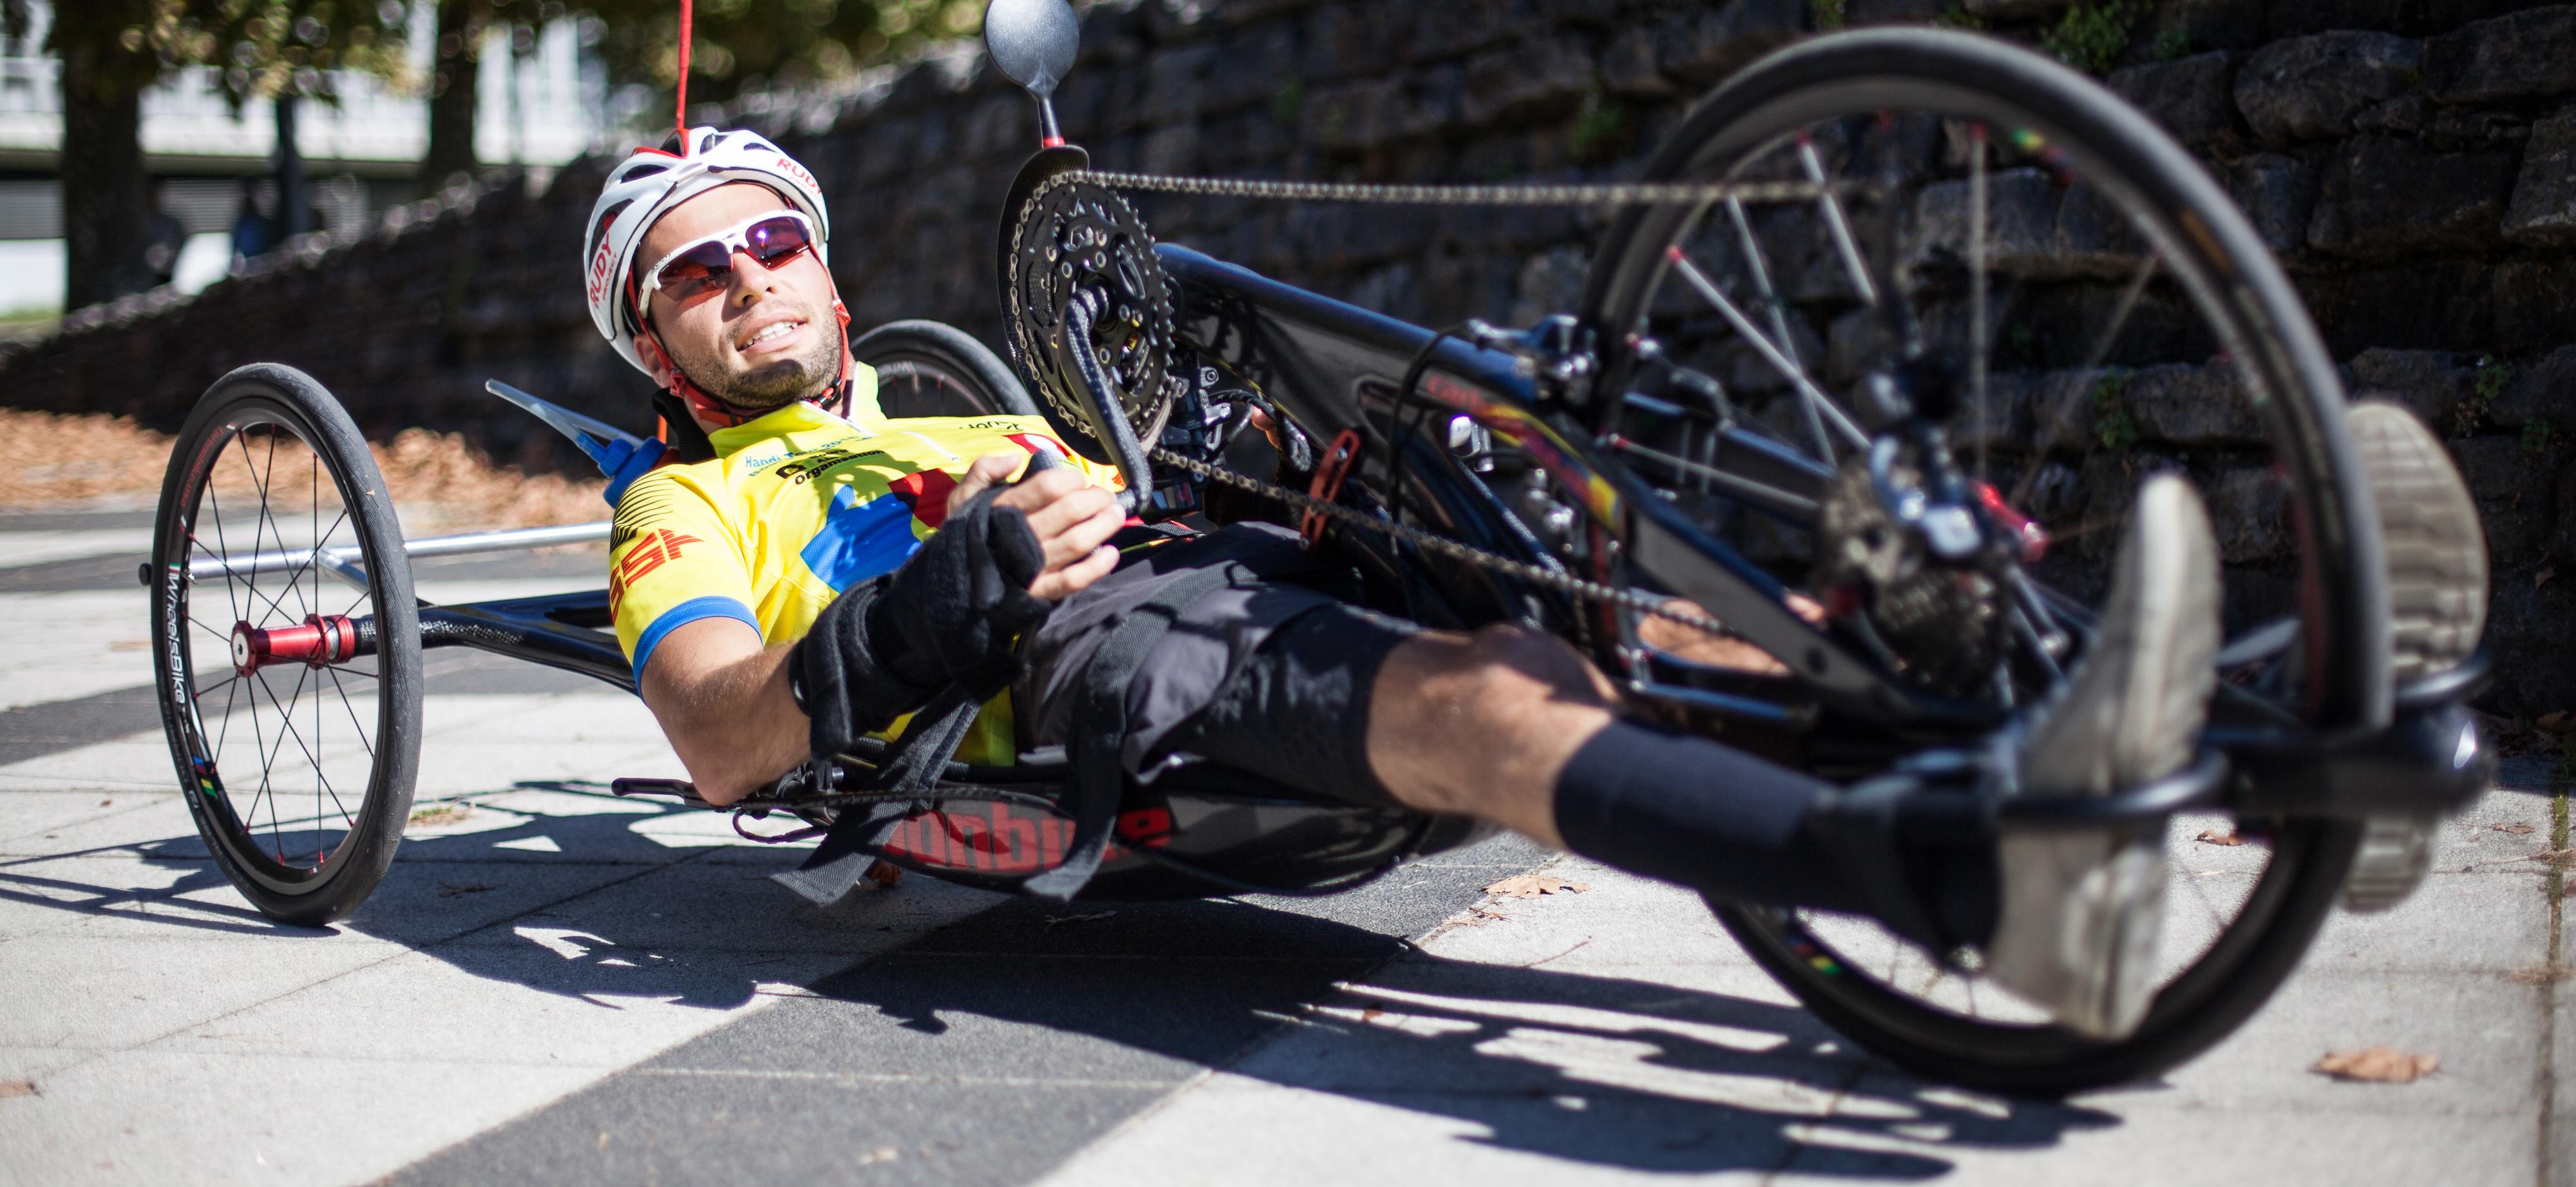 F. Jouanny, sur son handbike, avant l'Ironman